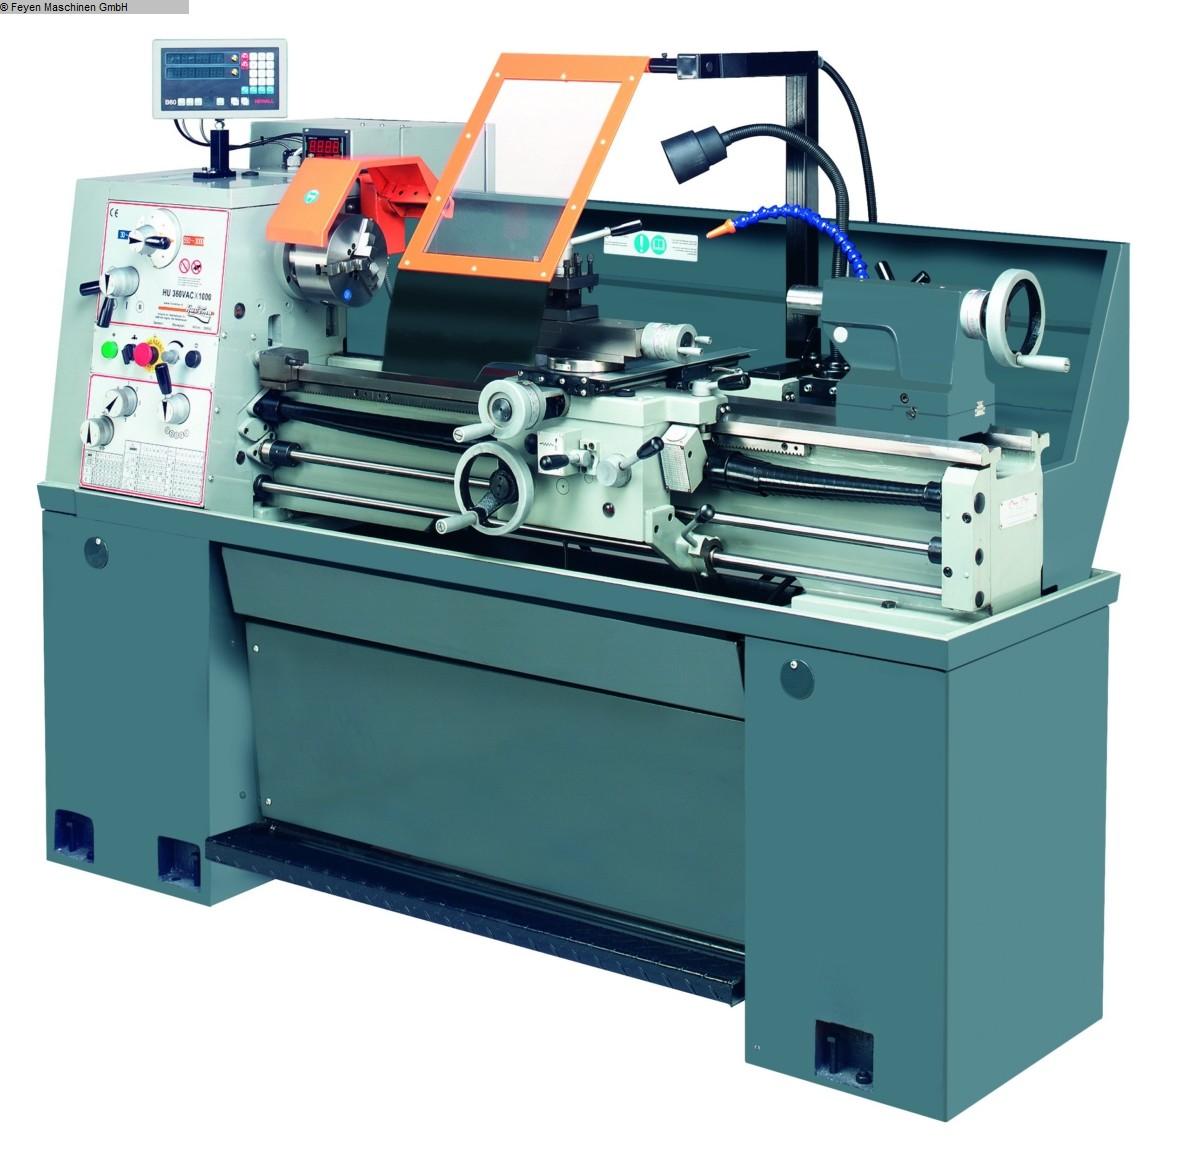 rabljeni Strojevi za tokarilice s tokarilicom HUVEMA HU 360x1000 VAC Topline